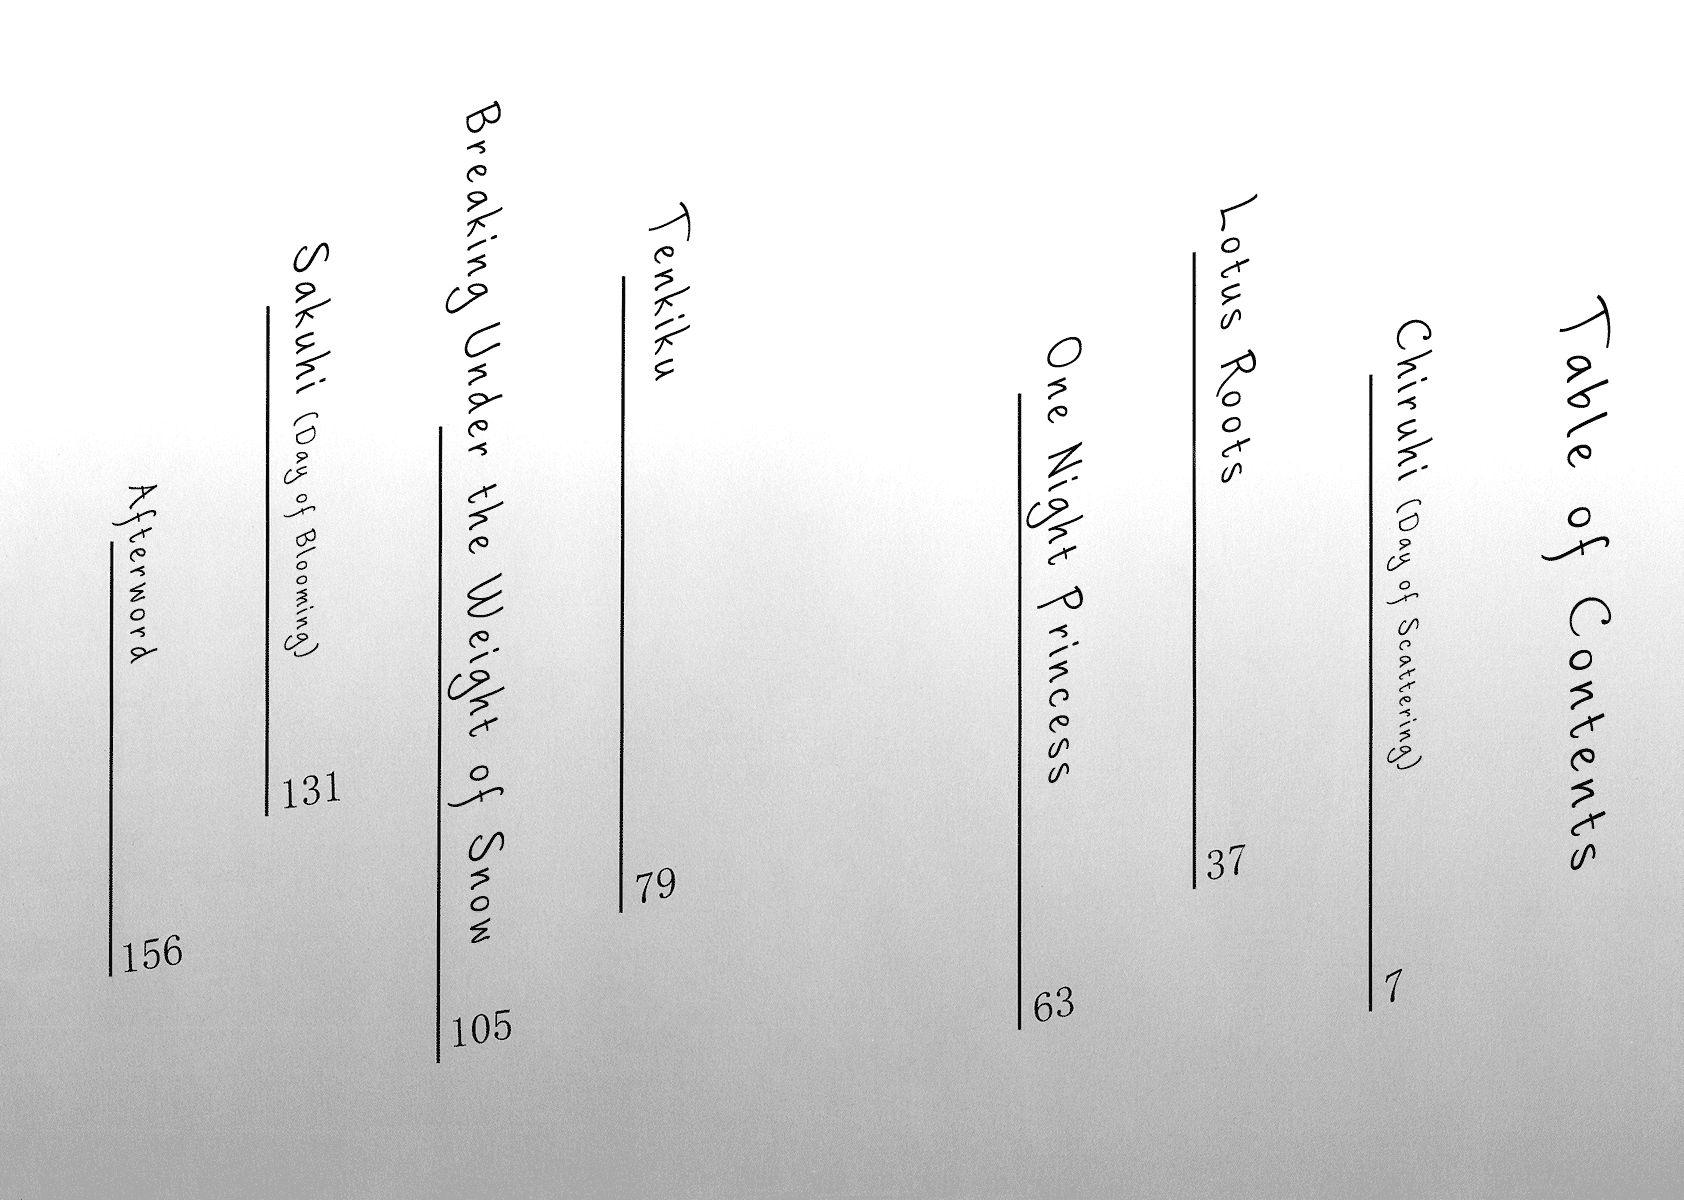 Chiruhi 1 Page 4